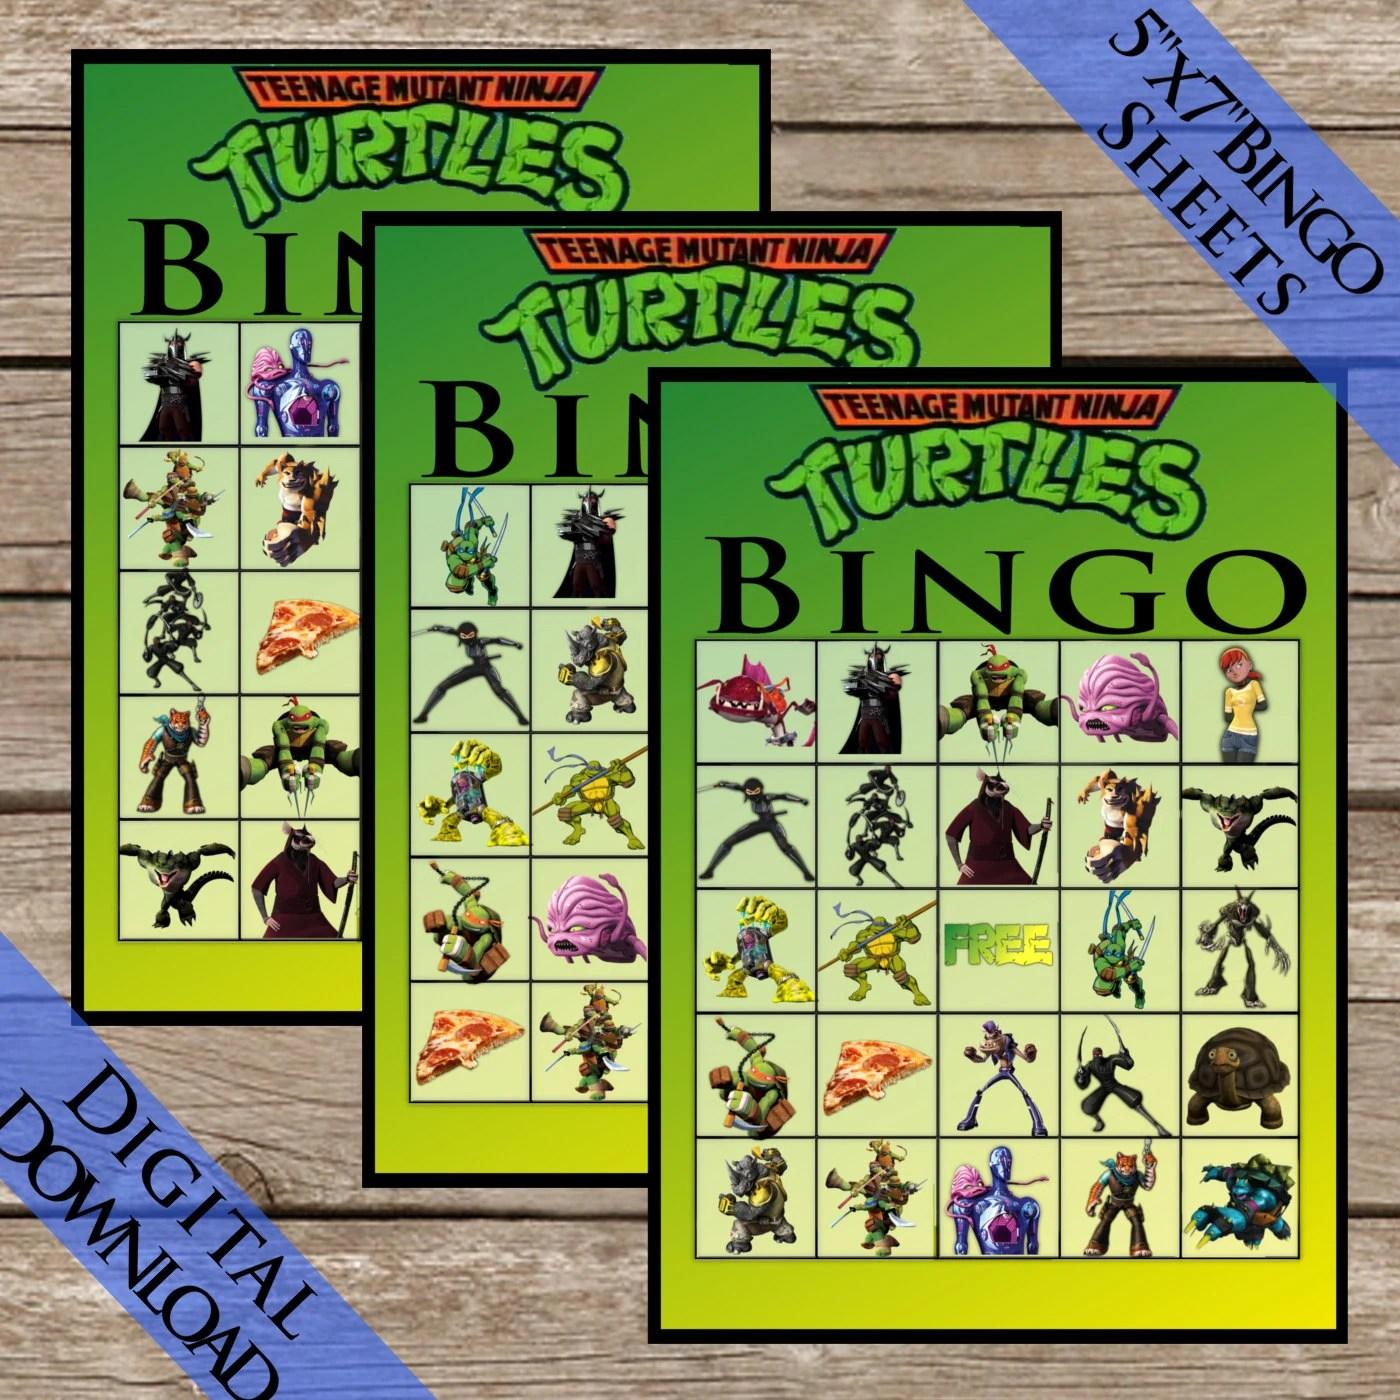 10 Ninja Turtles Bingo Cards Digital Download Extra